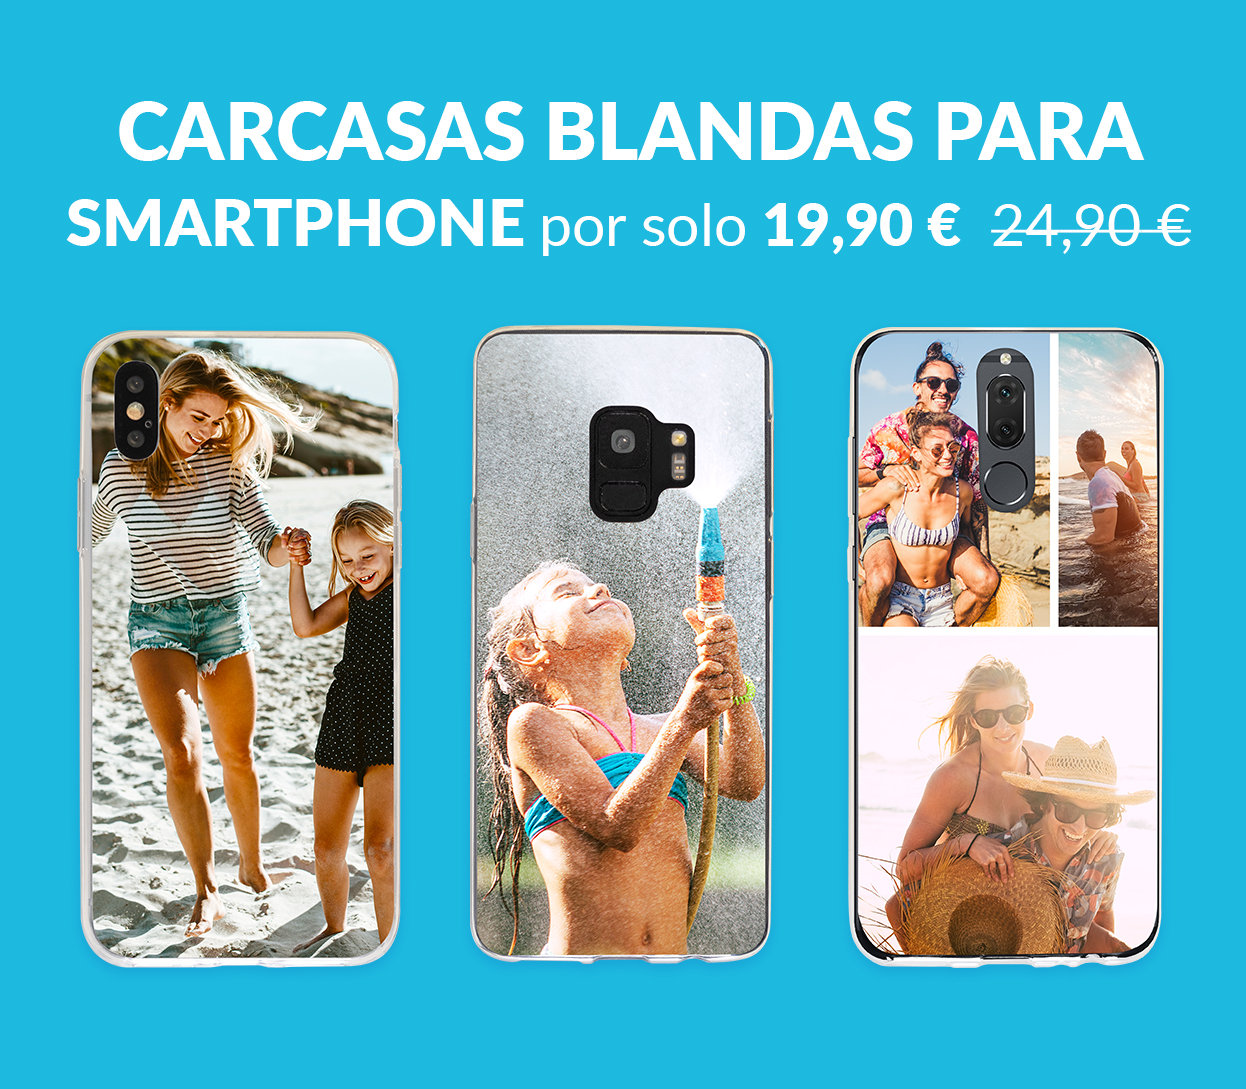 Carcasas blandas para smartphone por solo 19,90 € en lugar de 24,90 €